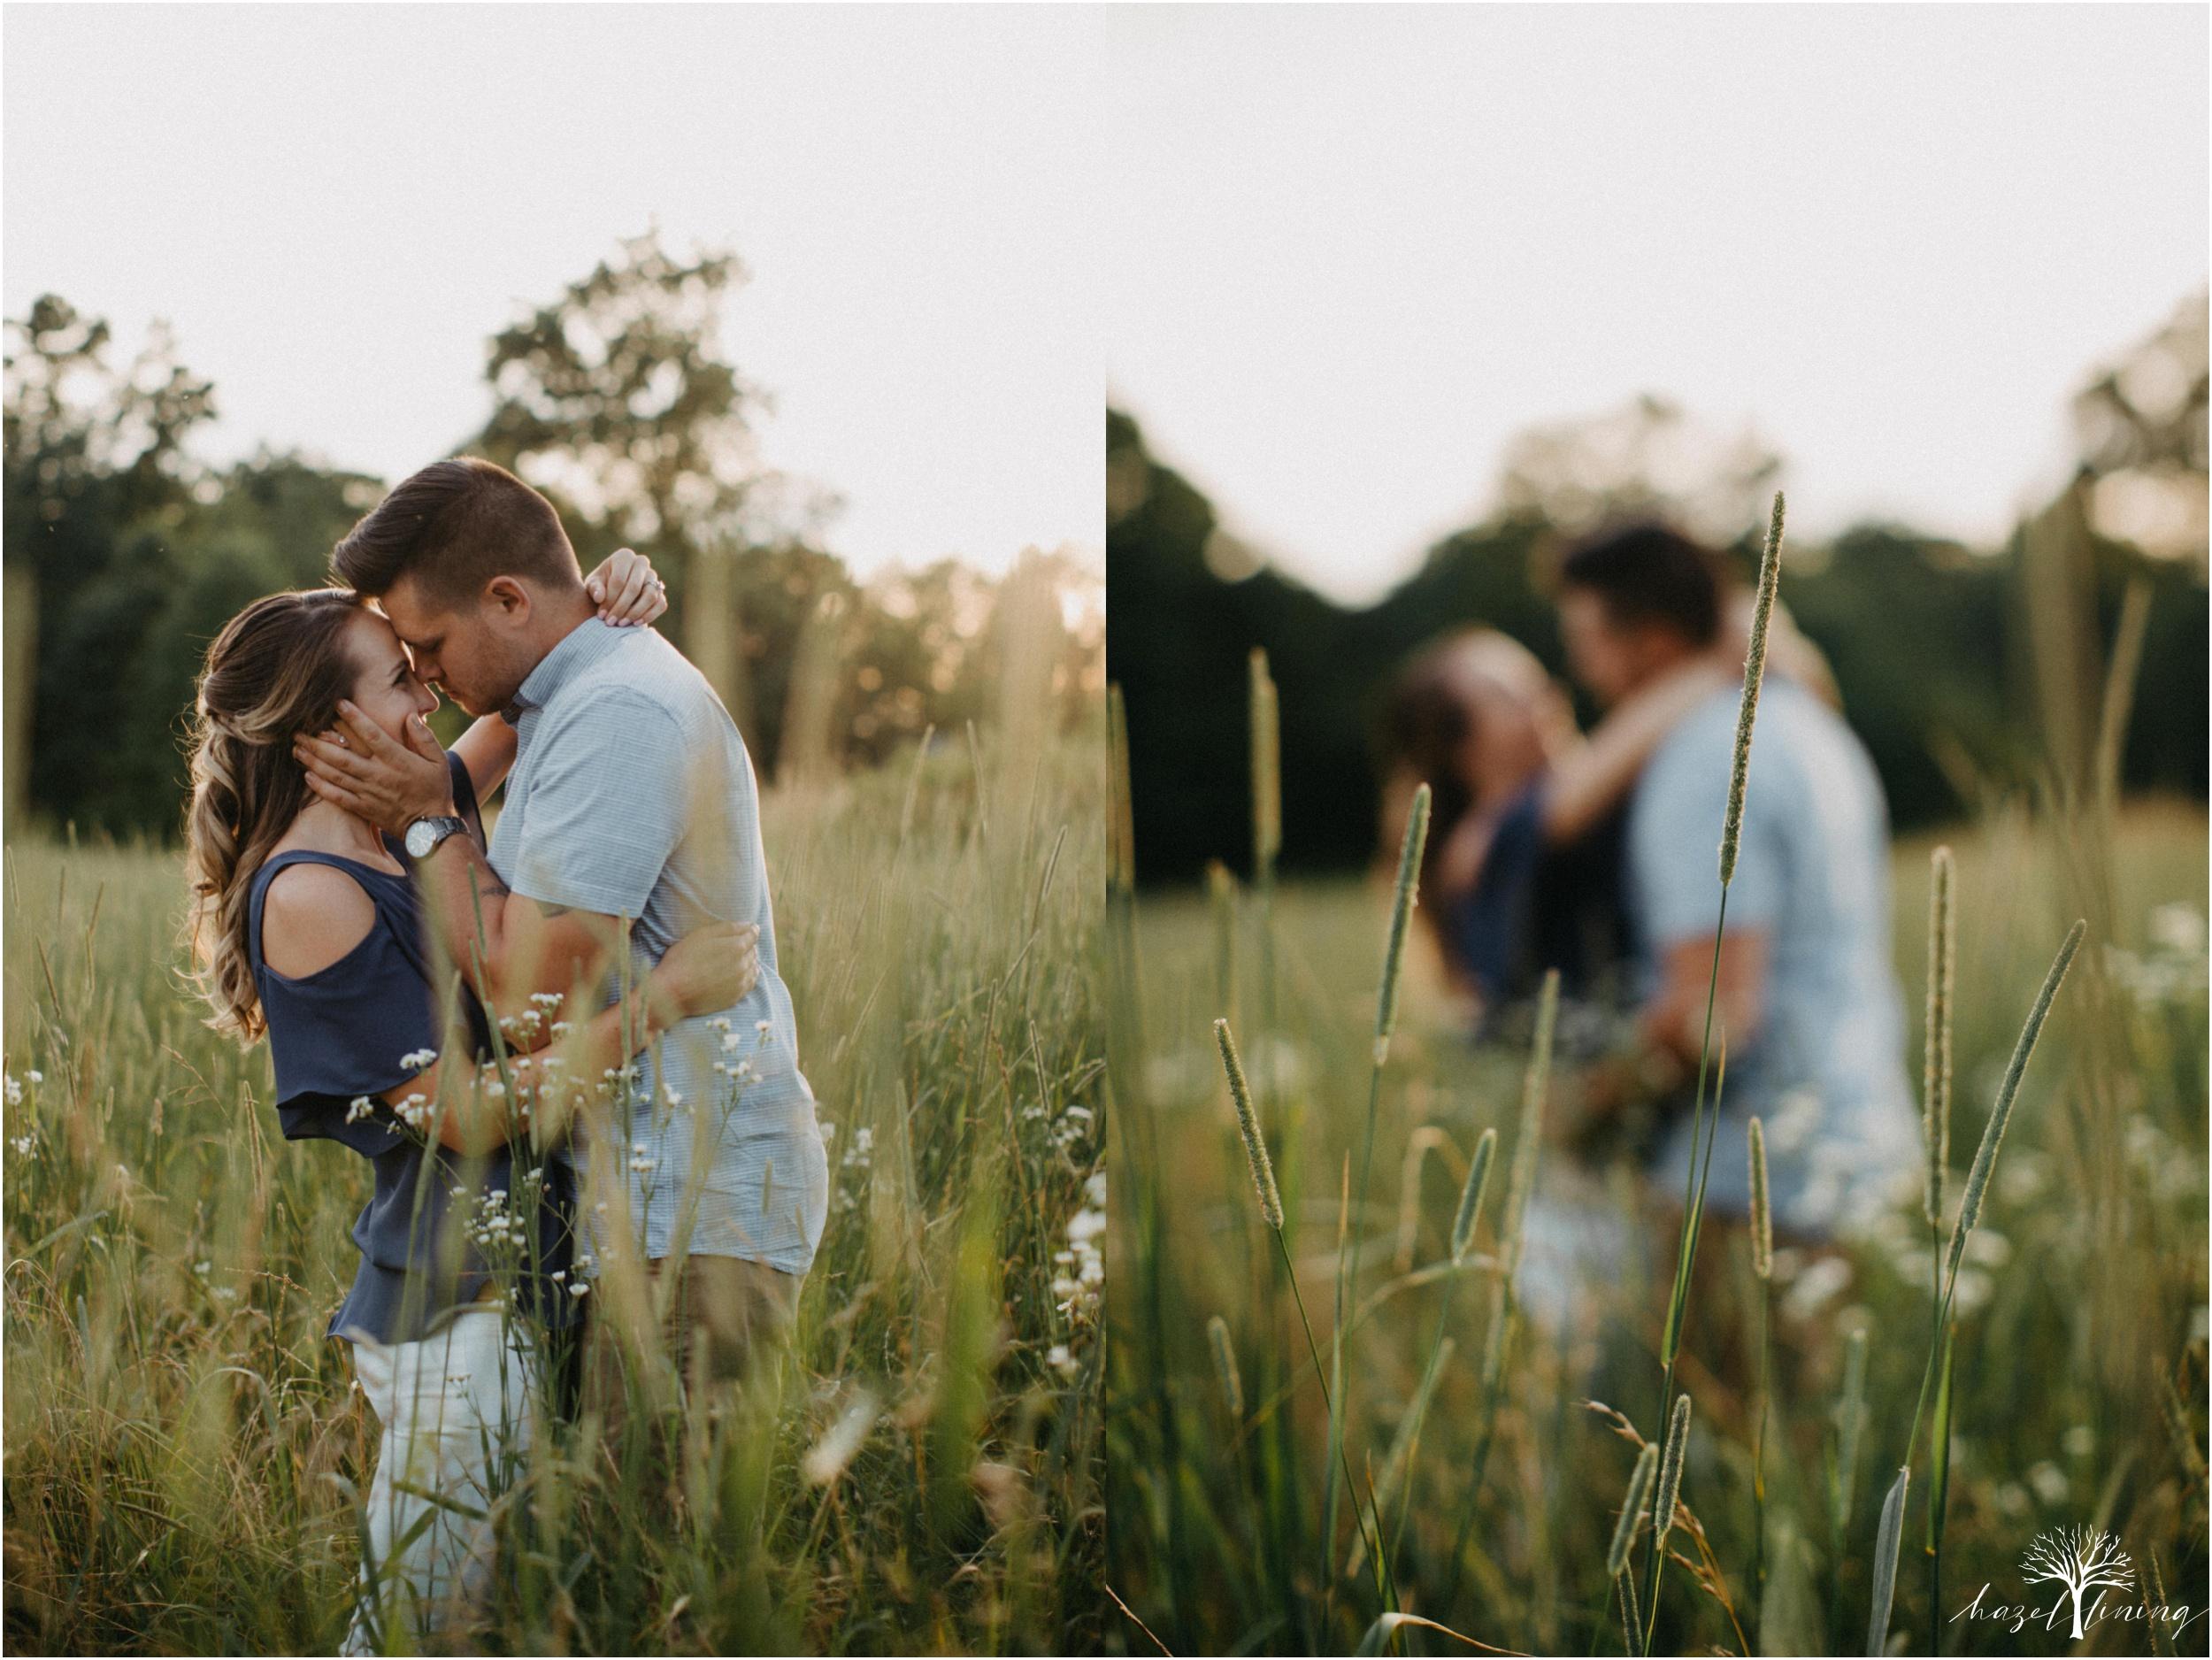 rachel-warner-chris-niedrist-the-farm-bakery-and-events-quakertown-pa-summer-engagement-hazel-lining-photography-destination-elopement-wedding-engagement-photography_0041.jpg